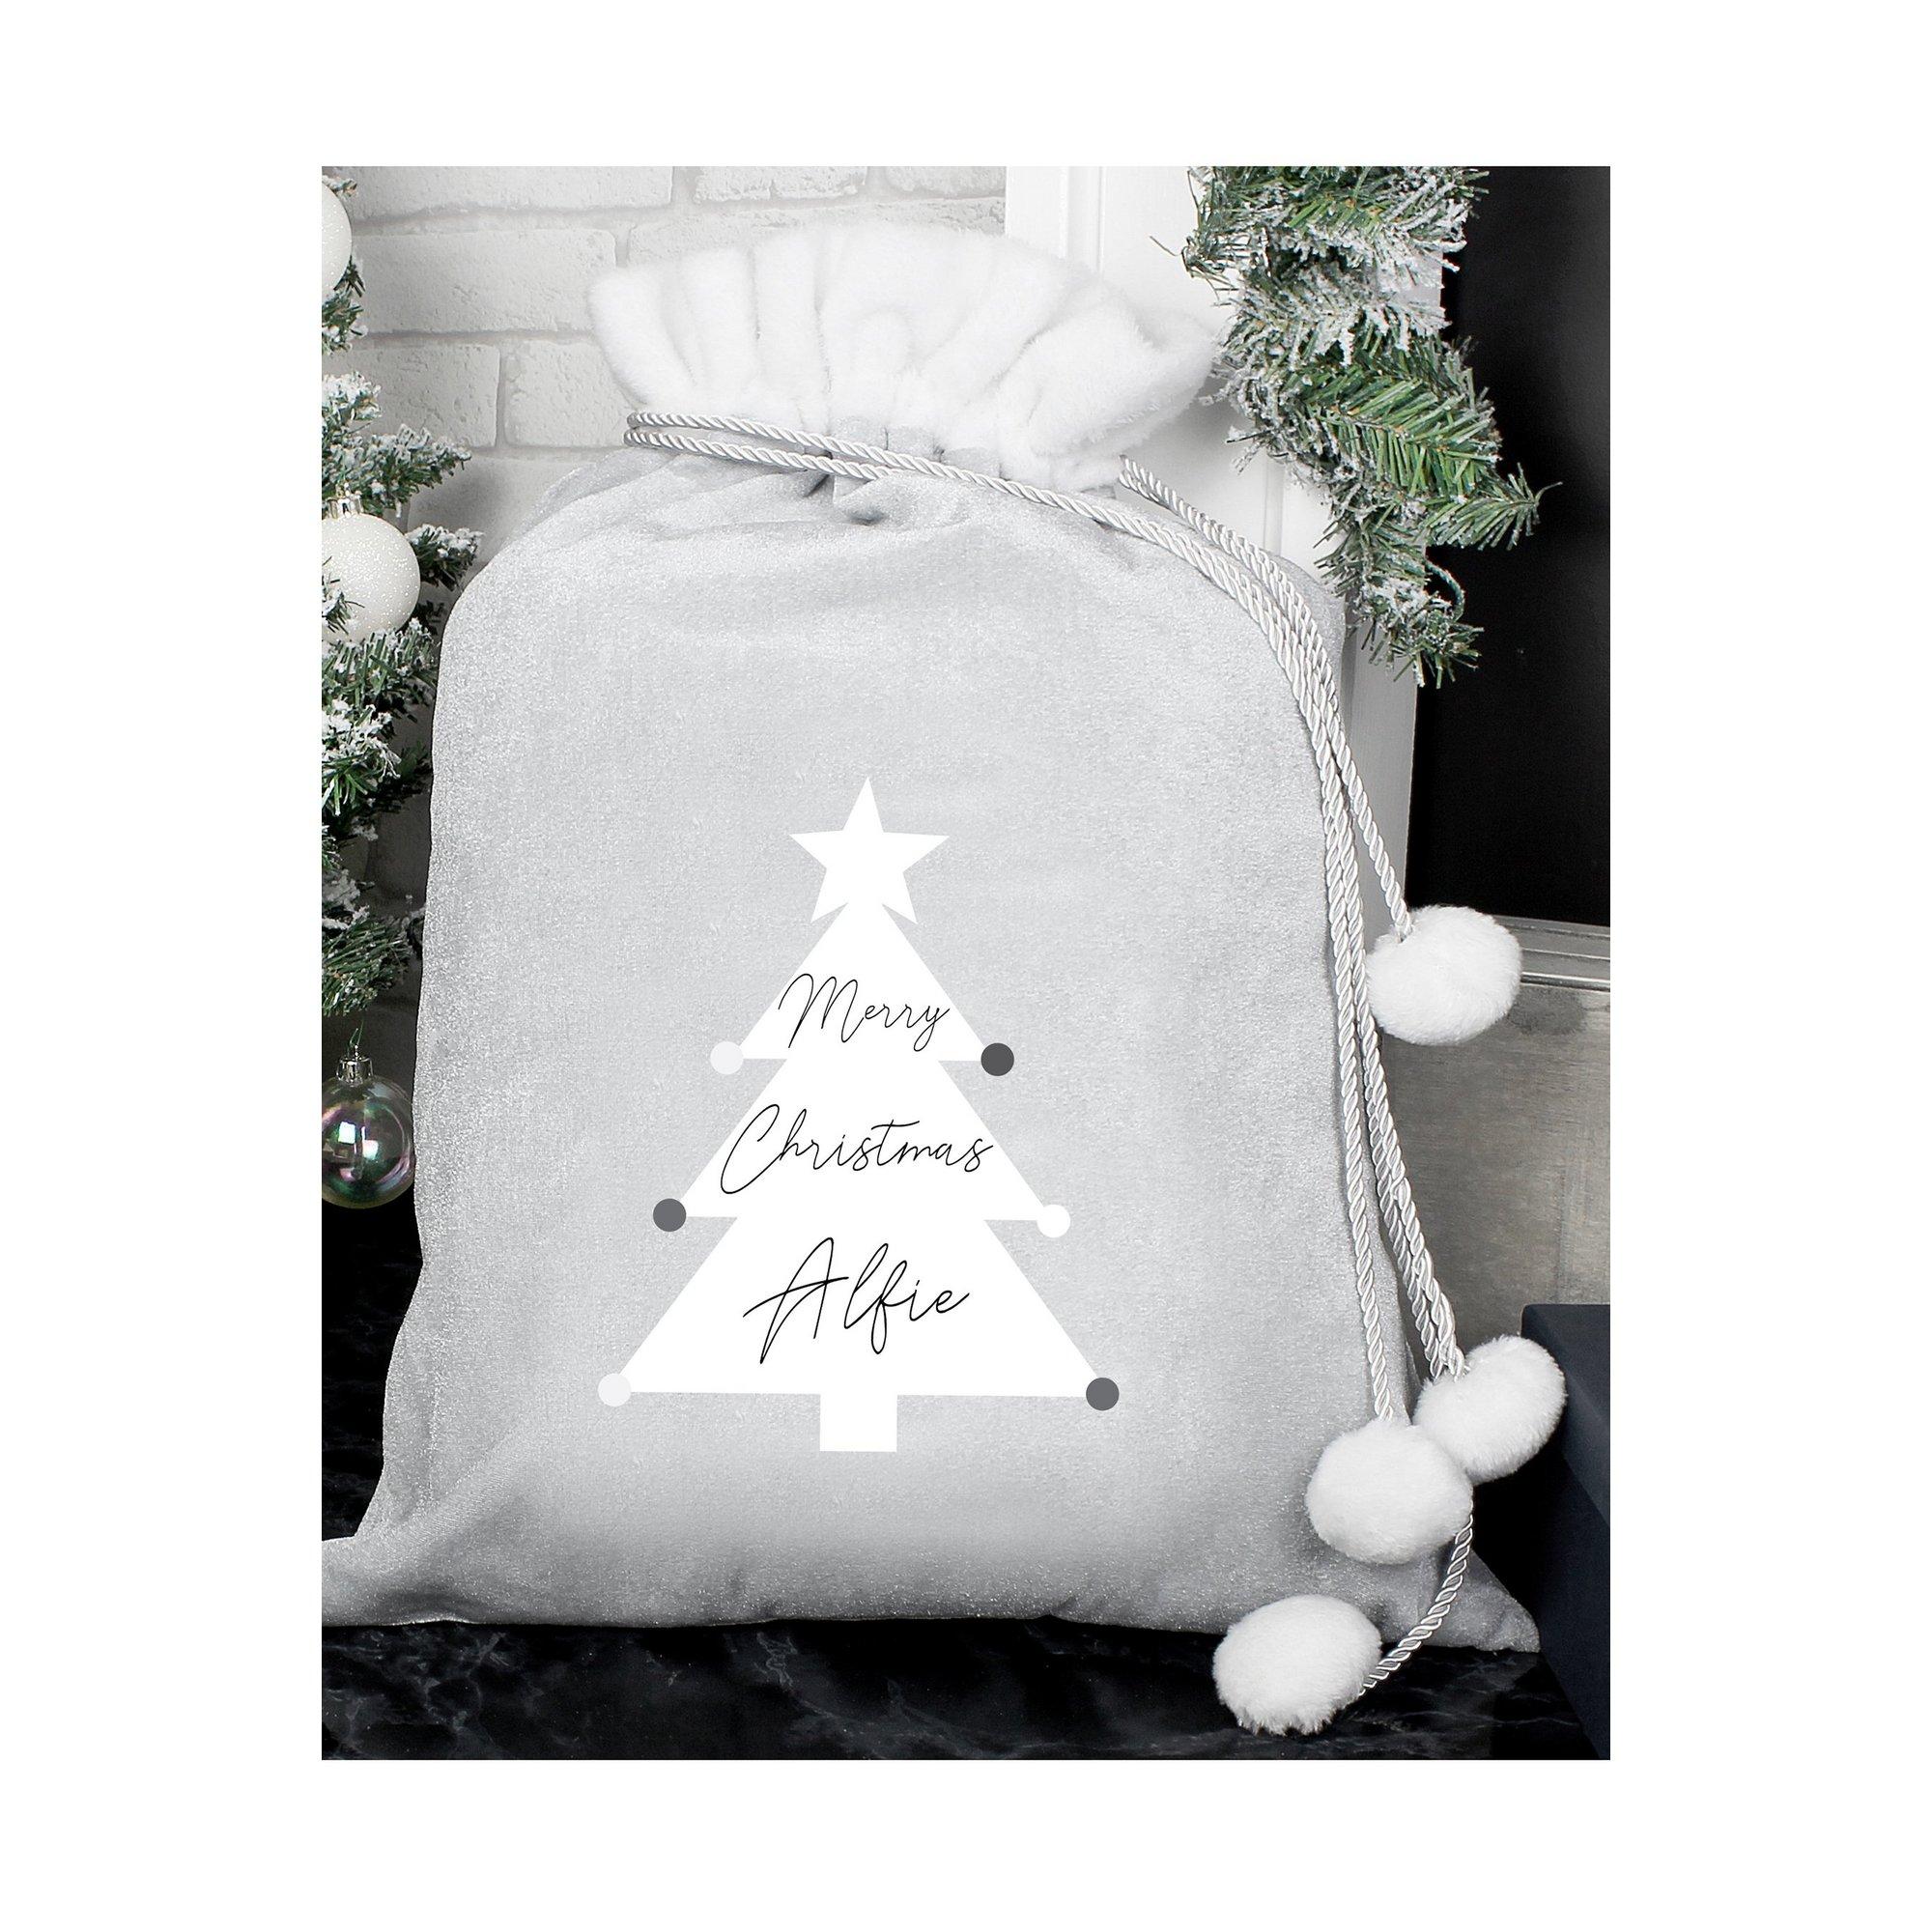 Image of Personalised Christmas Tree Luxury Silver Grey Pom Pom Sack